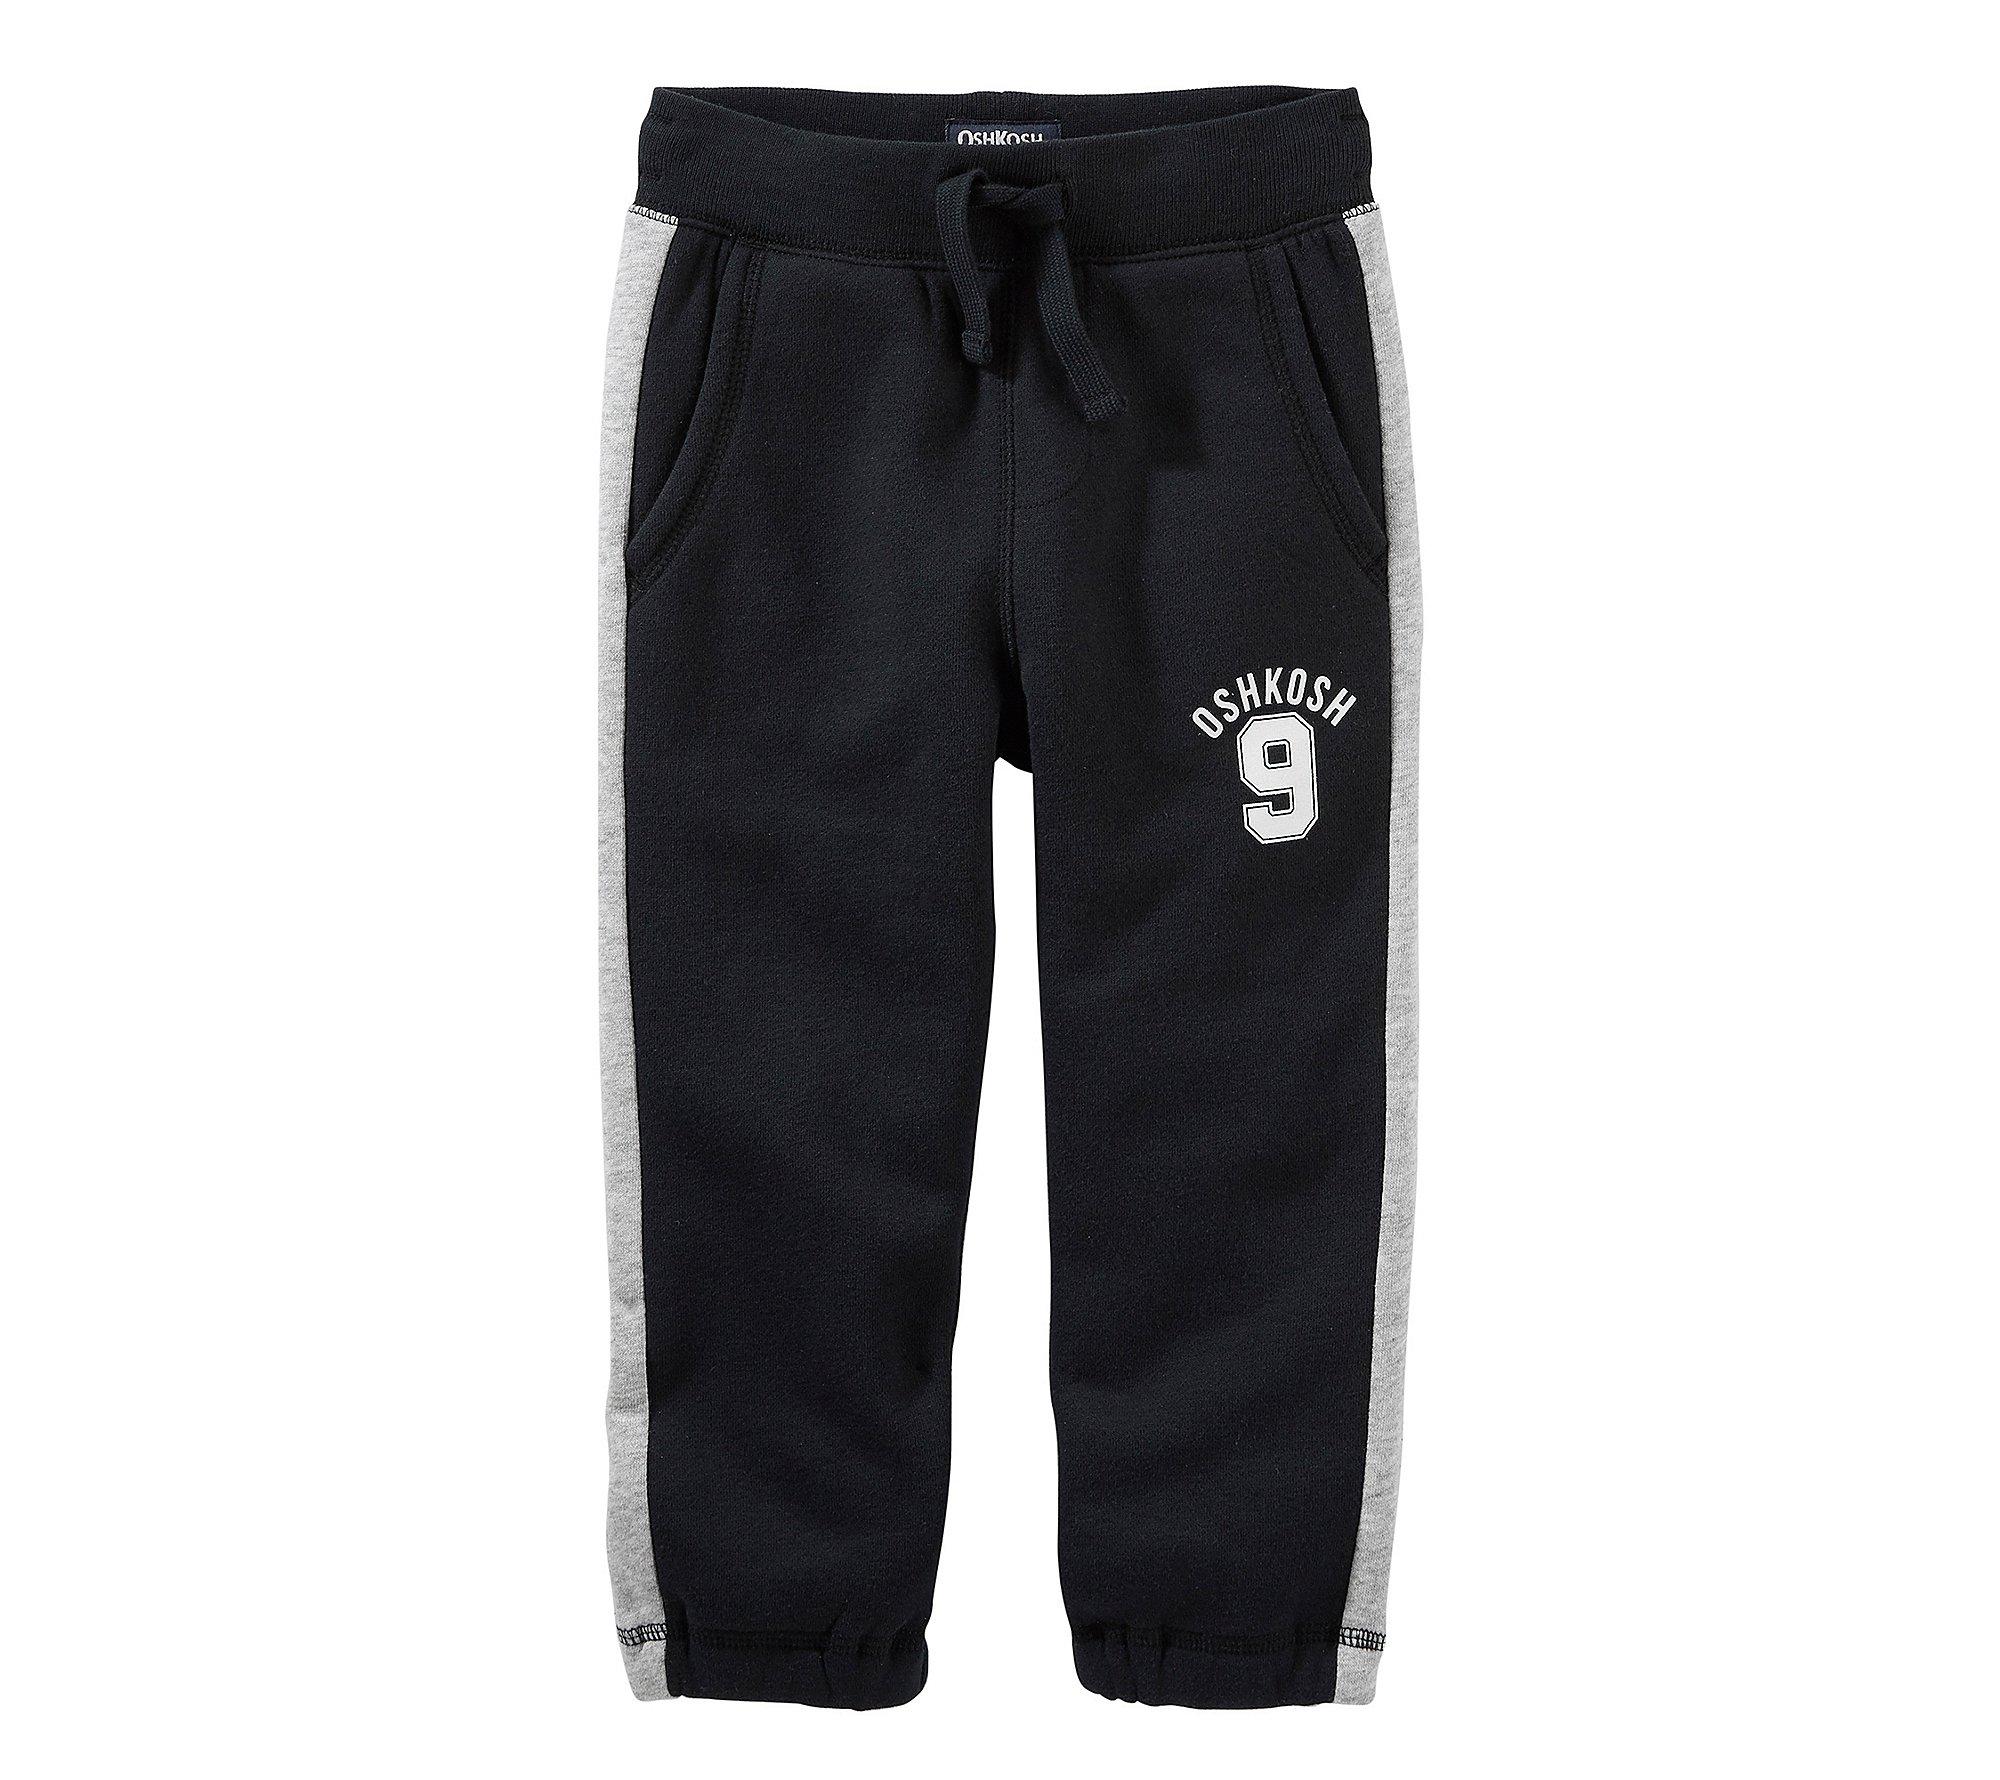 OshKosh B'Gosh Boys' 2T-7 Classic Fit Drawstring Pants Black 4T